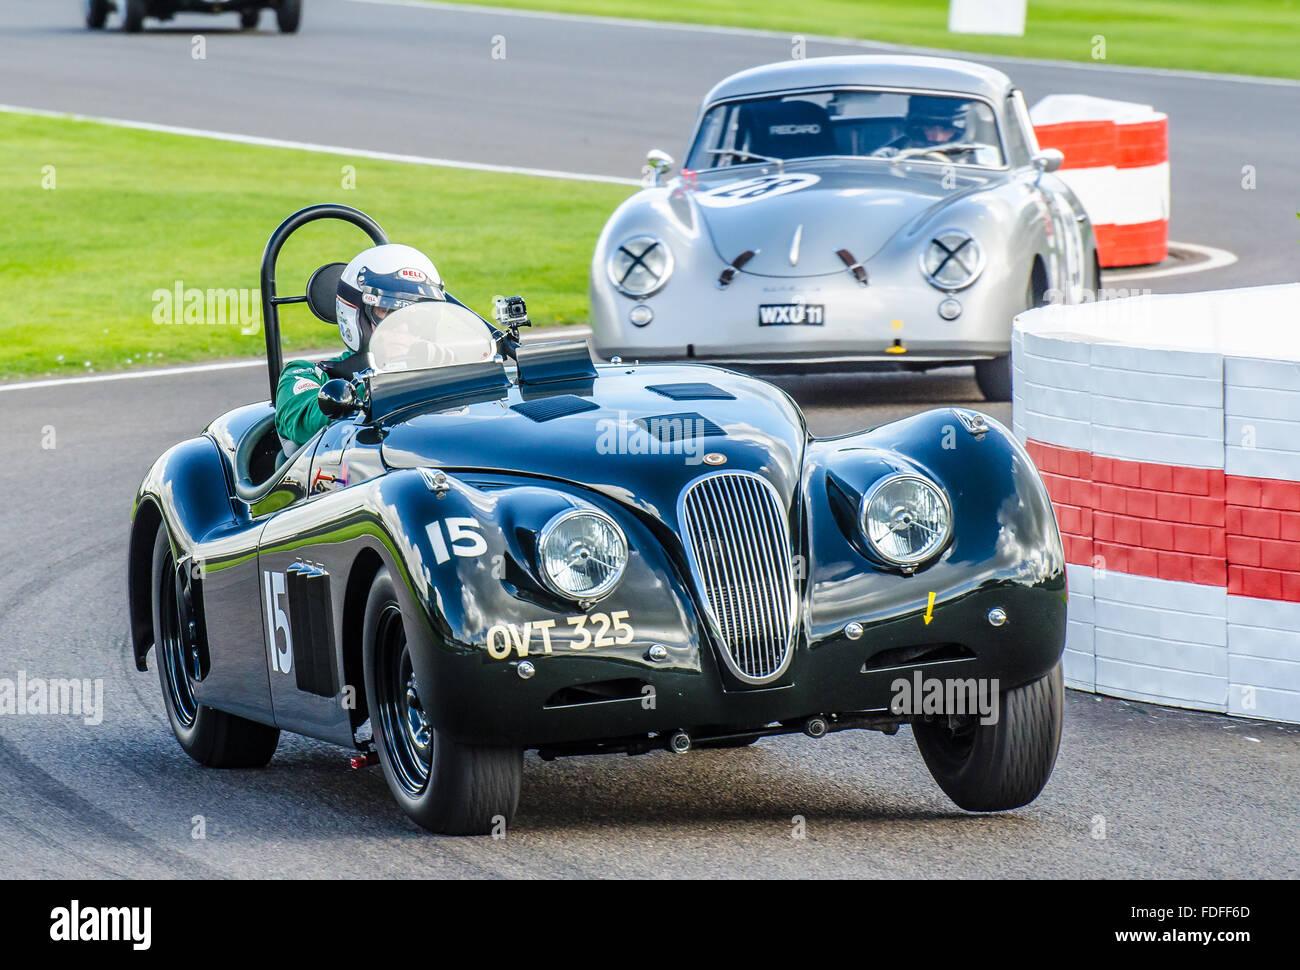 A 1950 Jaguar Xk120 Owned By Derek Hood And Raced By John